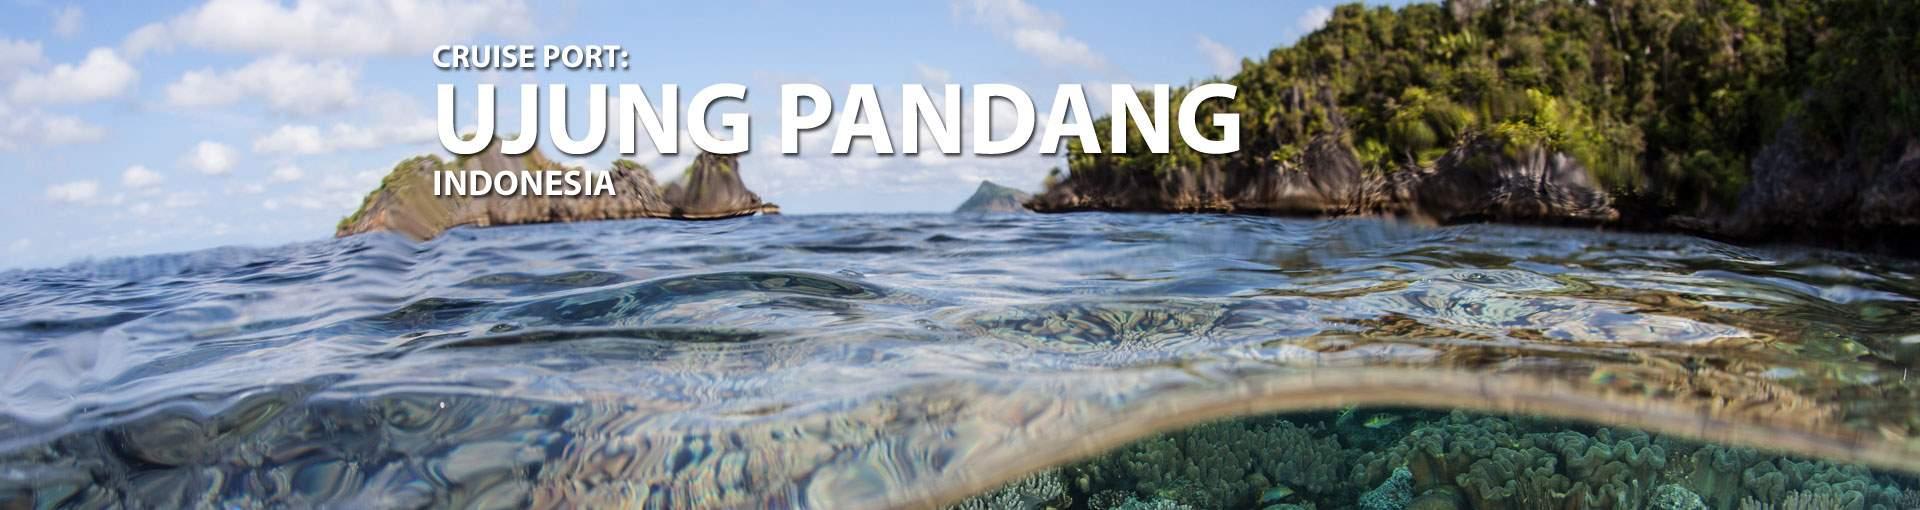 Cruises to Ujung Pandang, Indonesia